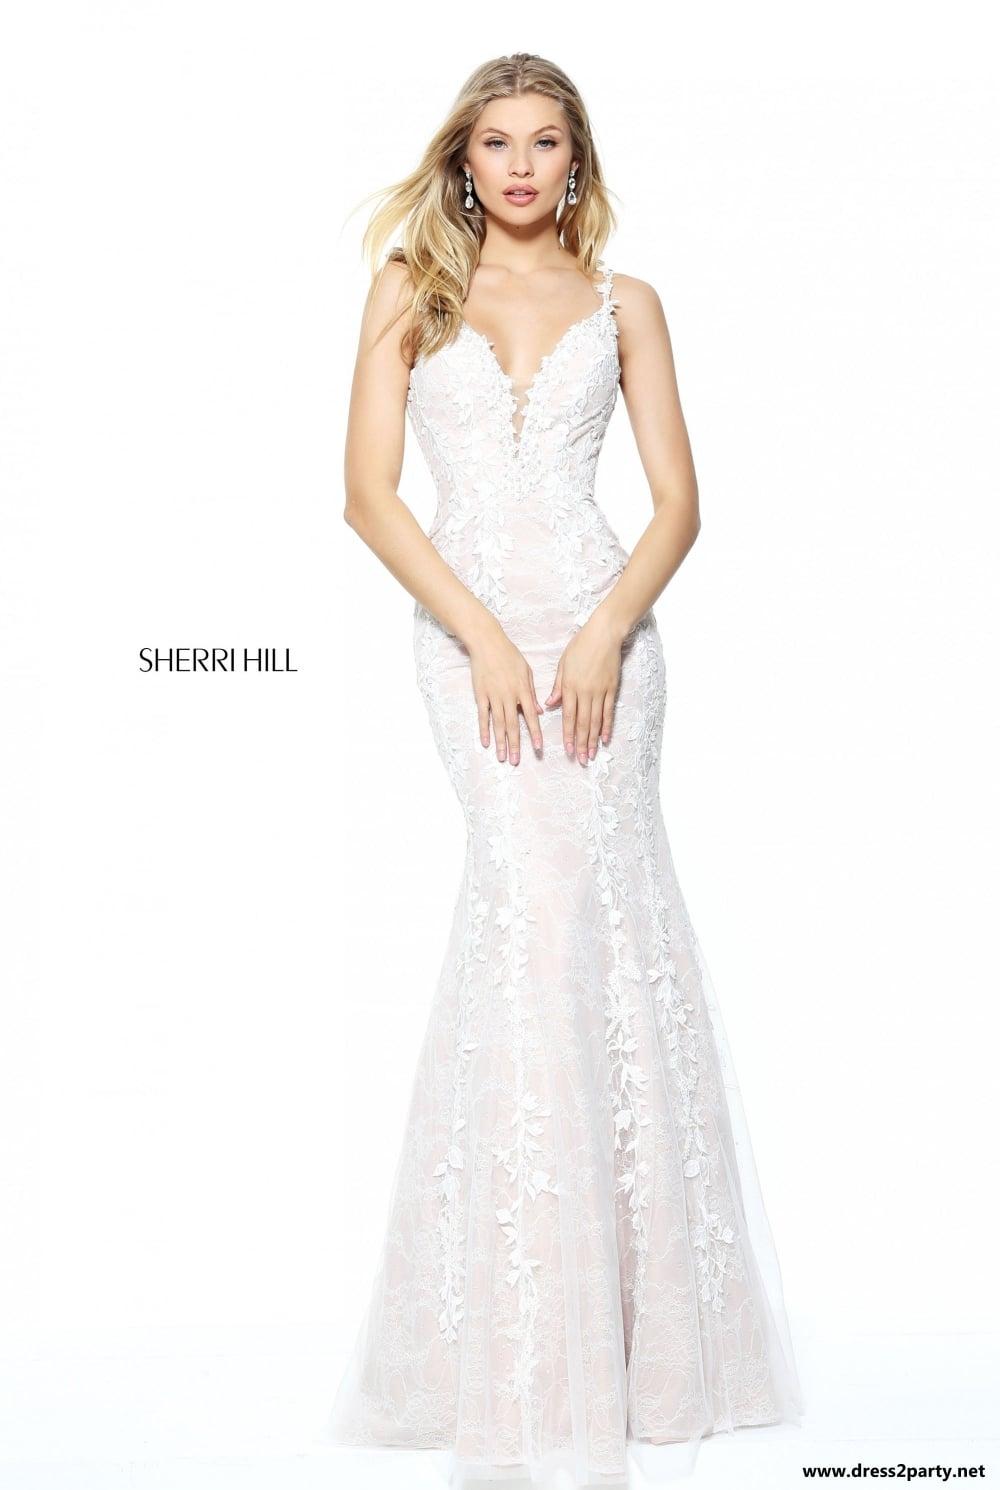 sherri hill wedding dresses photo - 1